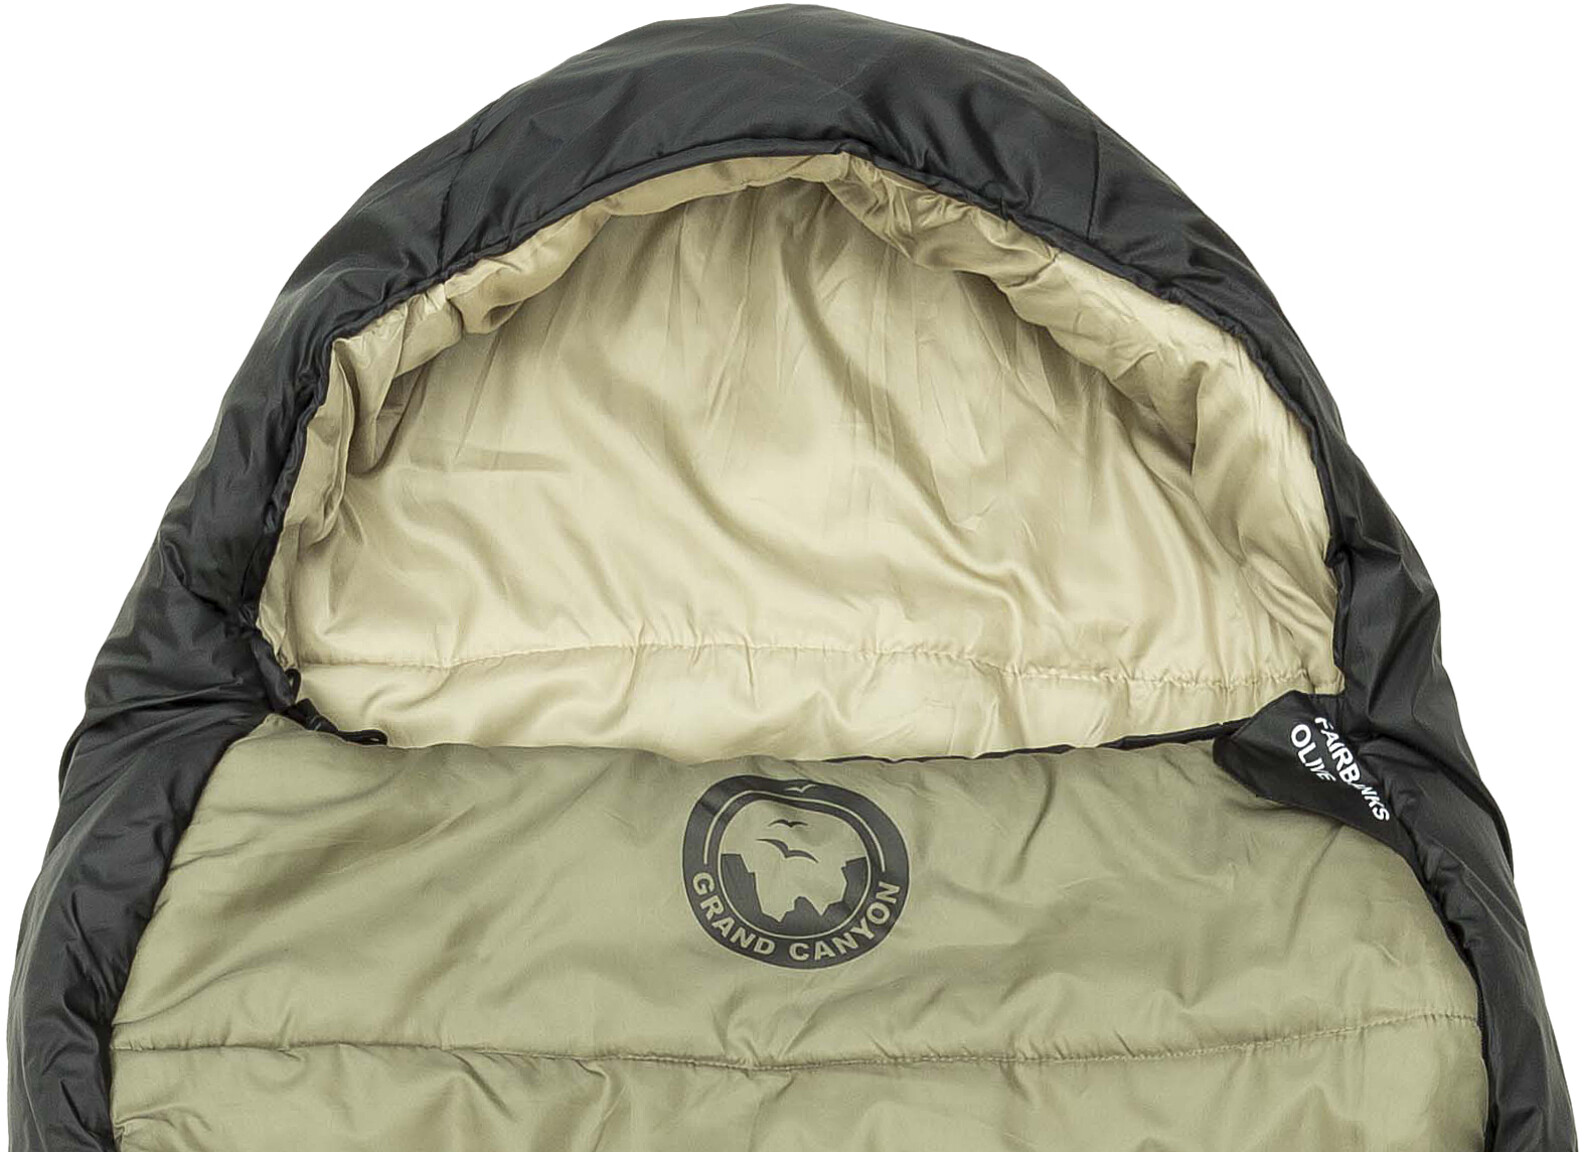 newest 4e671 dc652 Grand Canyon Fairbanks 190 Sleeping Bag olive